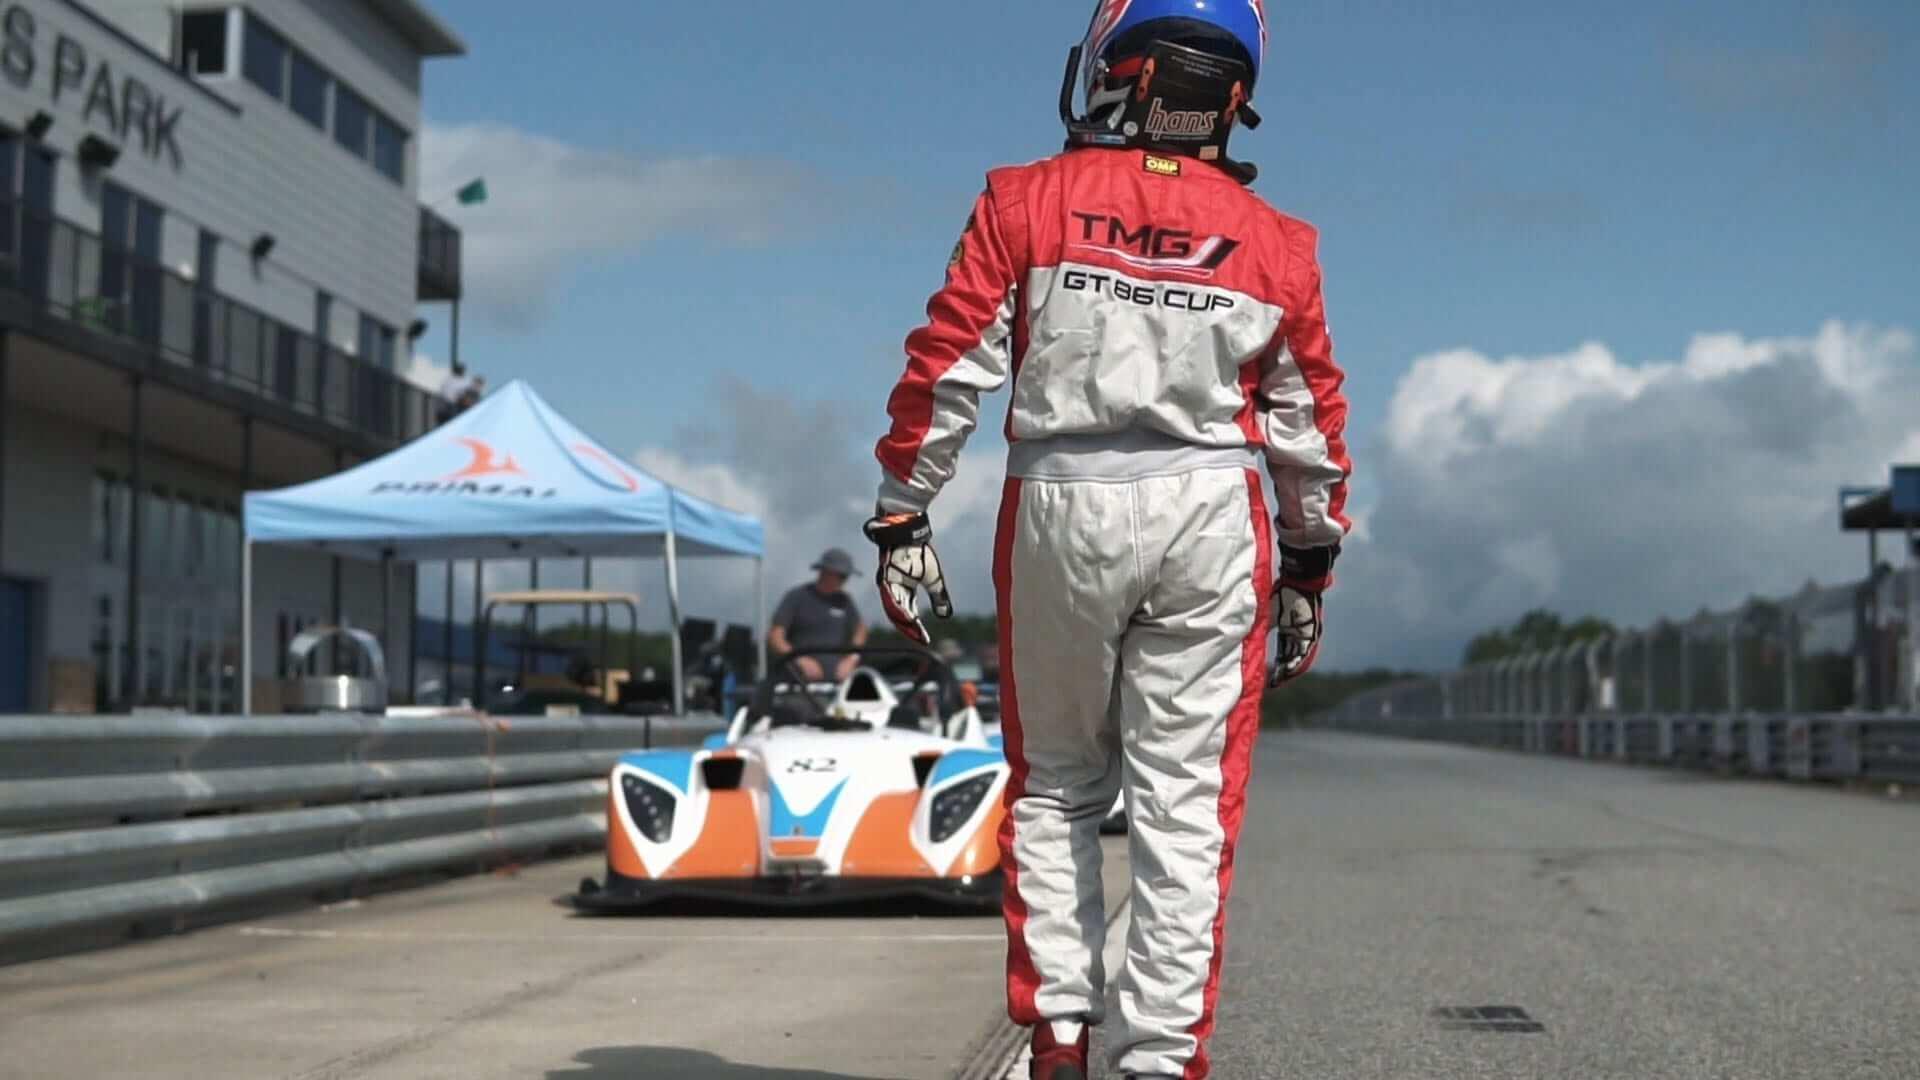 primal raceday screen1 - 2021 Summer Championship Series